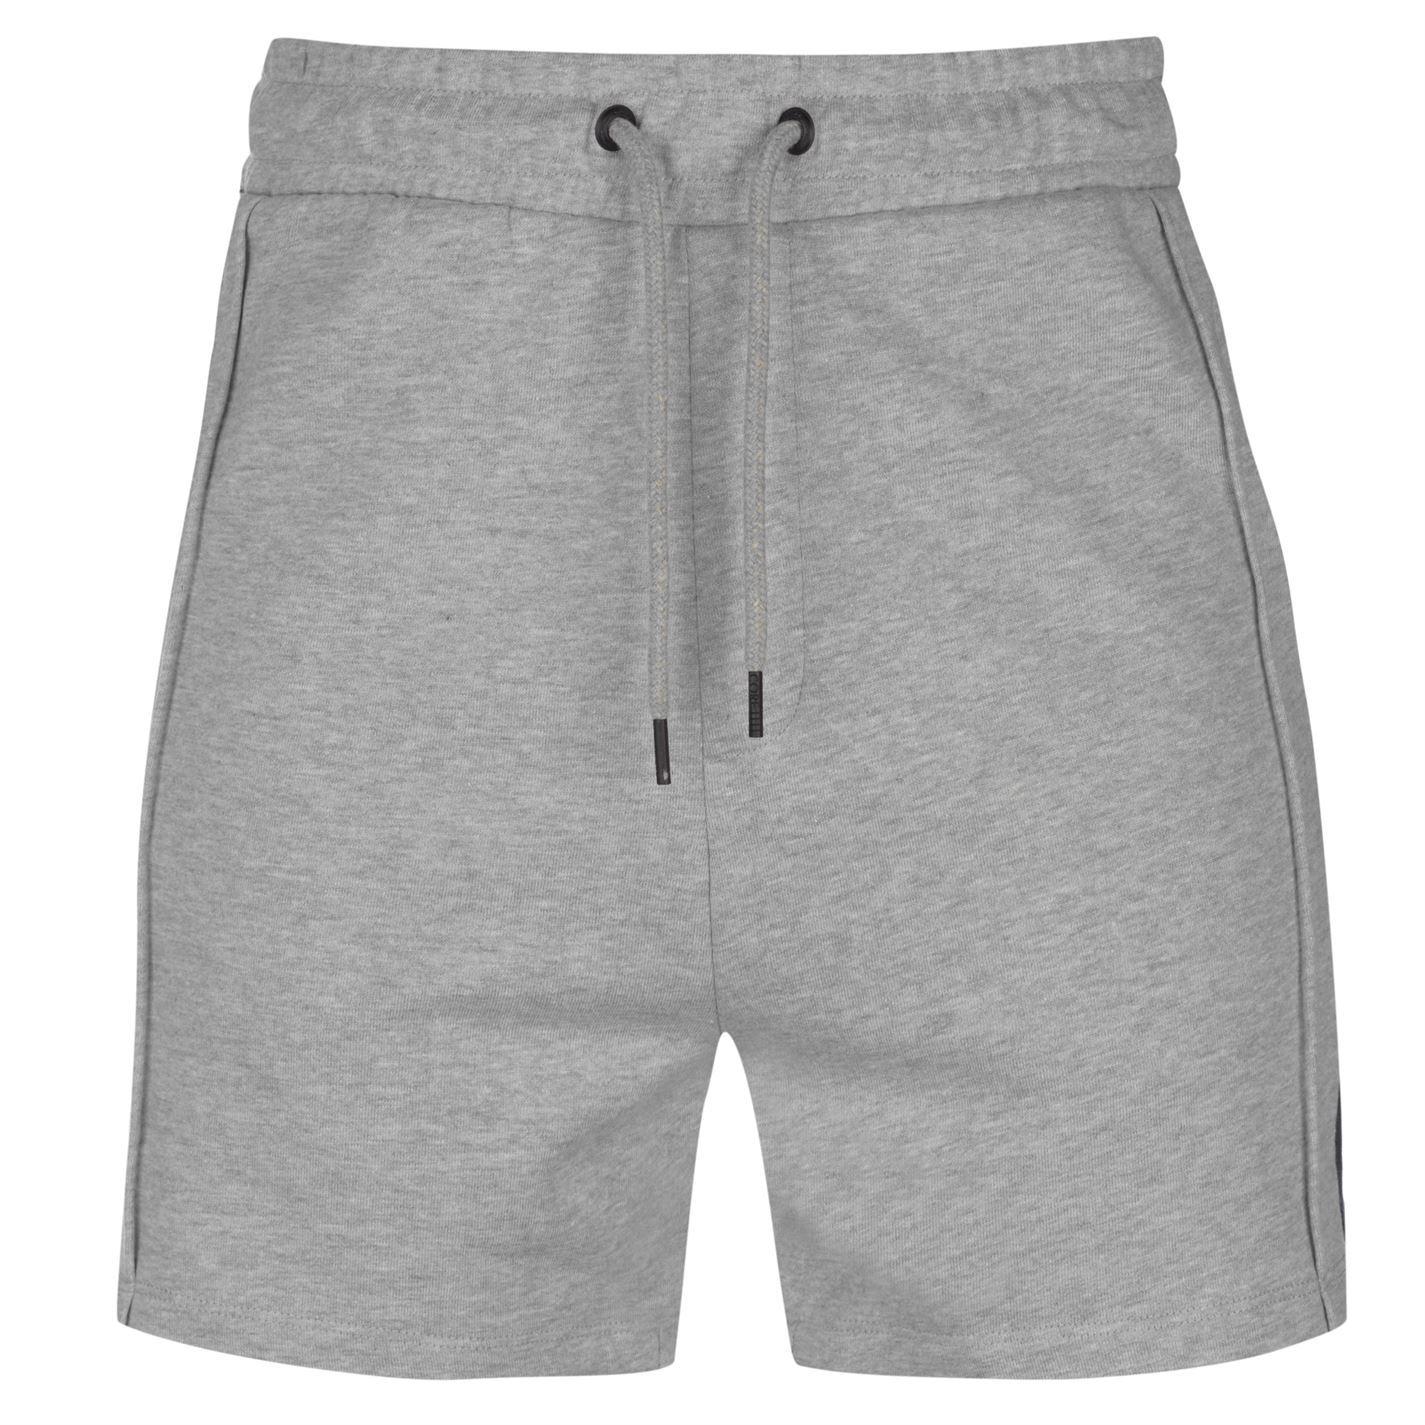 Jack-amp-Jones-Core-Dexter-Shorts-Mens-Bottoms-Short-Pants-Summerwear thumbnail 3